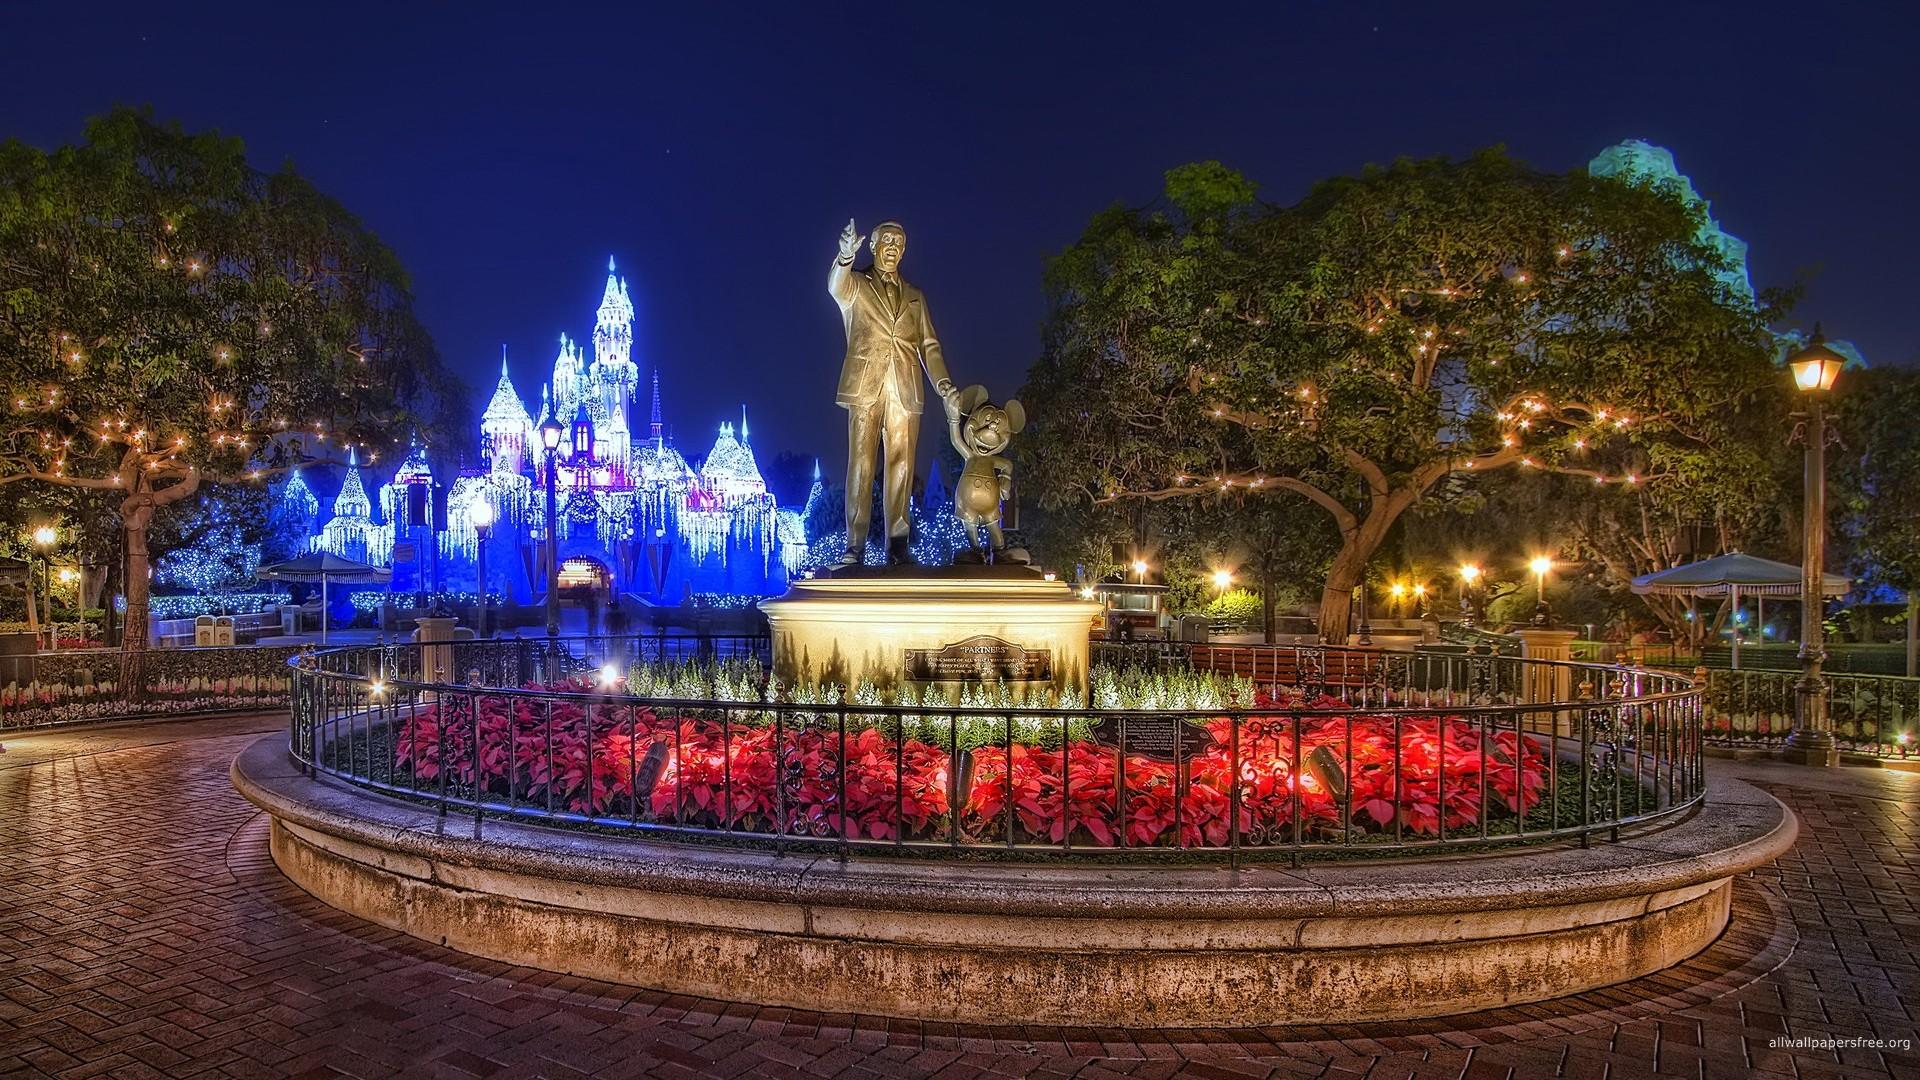 Walt Disney World Iphone Wallpaper Disney World Wallpaper 183 ① Download Free Backgrounds For